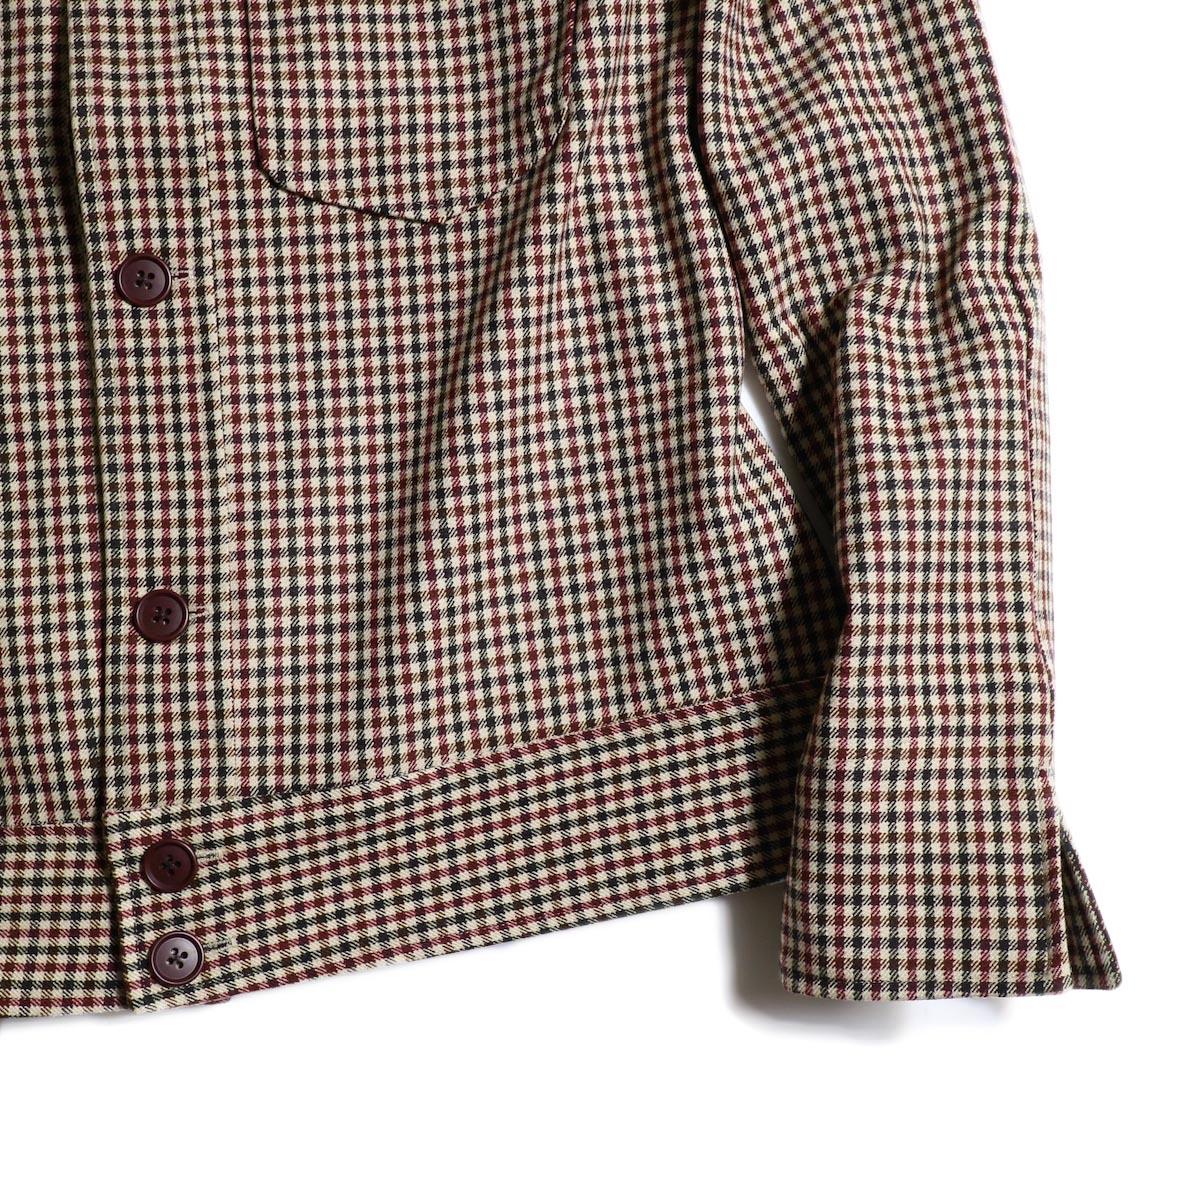 Needles / Cowboy Leisure Jacket -Gunclub Plaid (Bordeaux)袖、裾